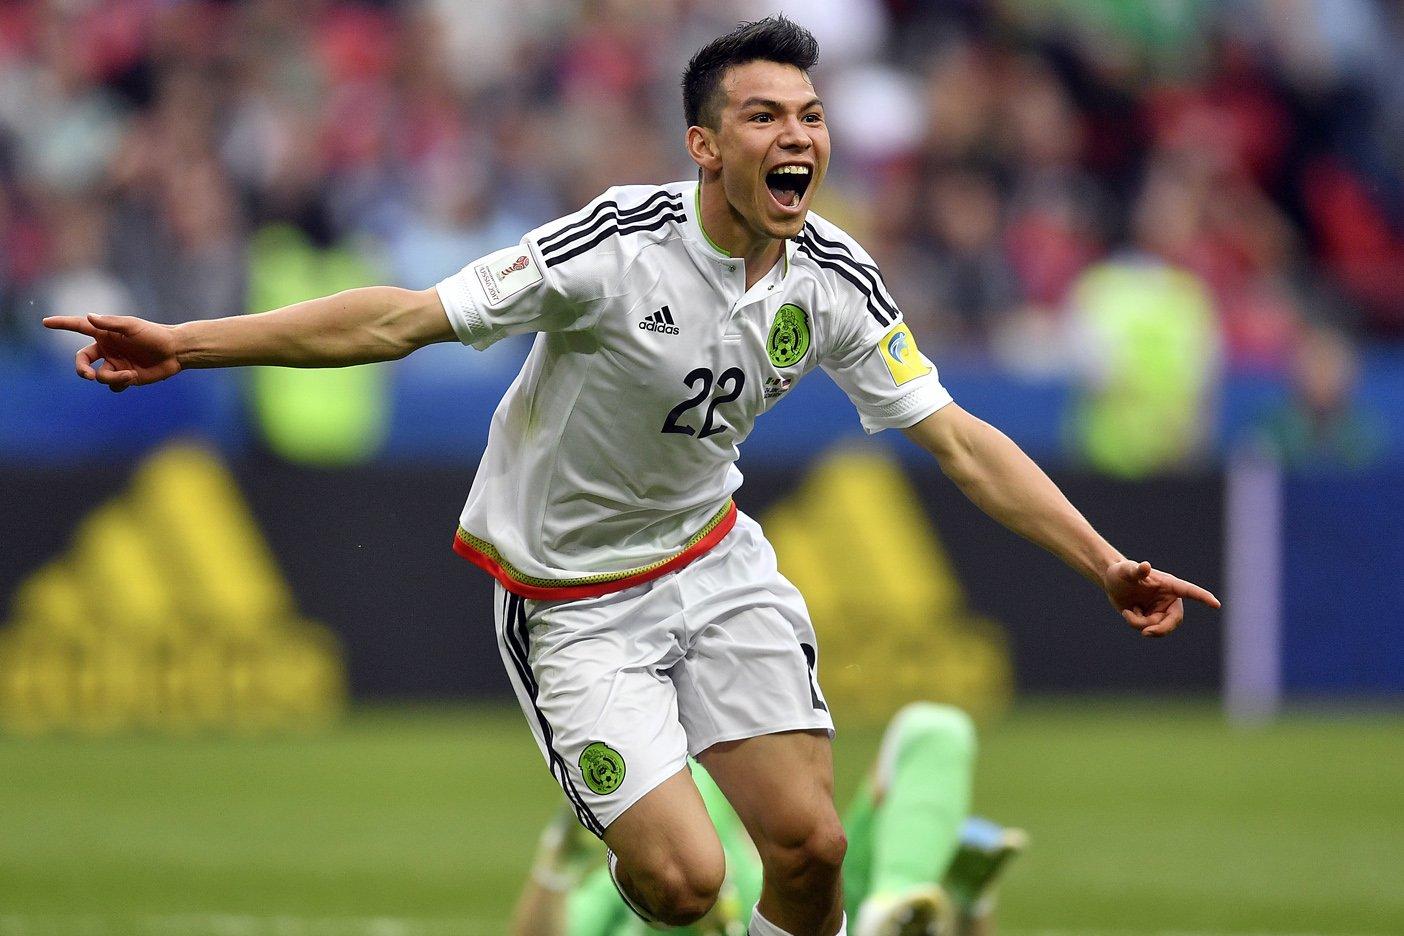 Lozano mostró la huella de la patada que recibió en el gol